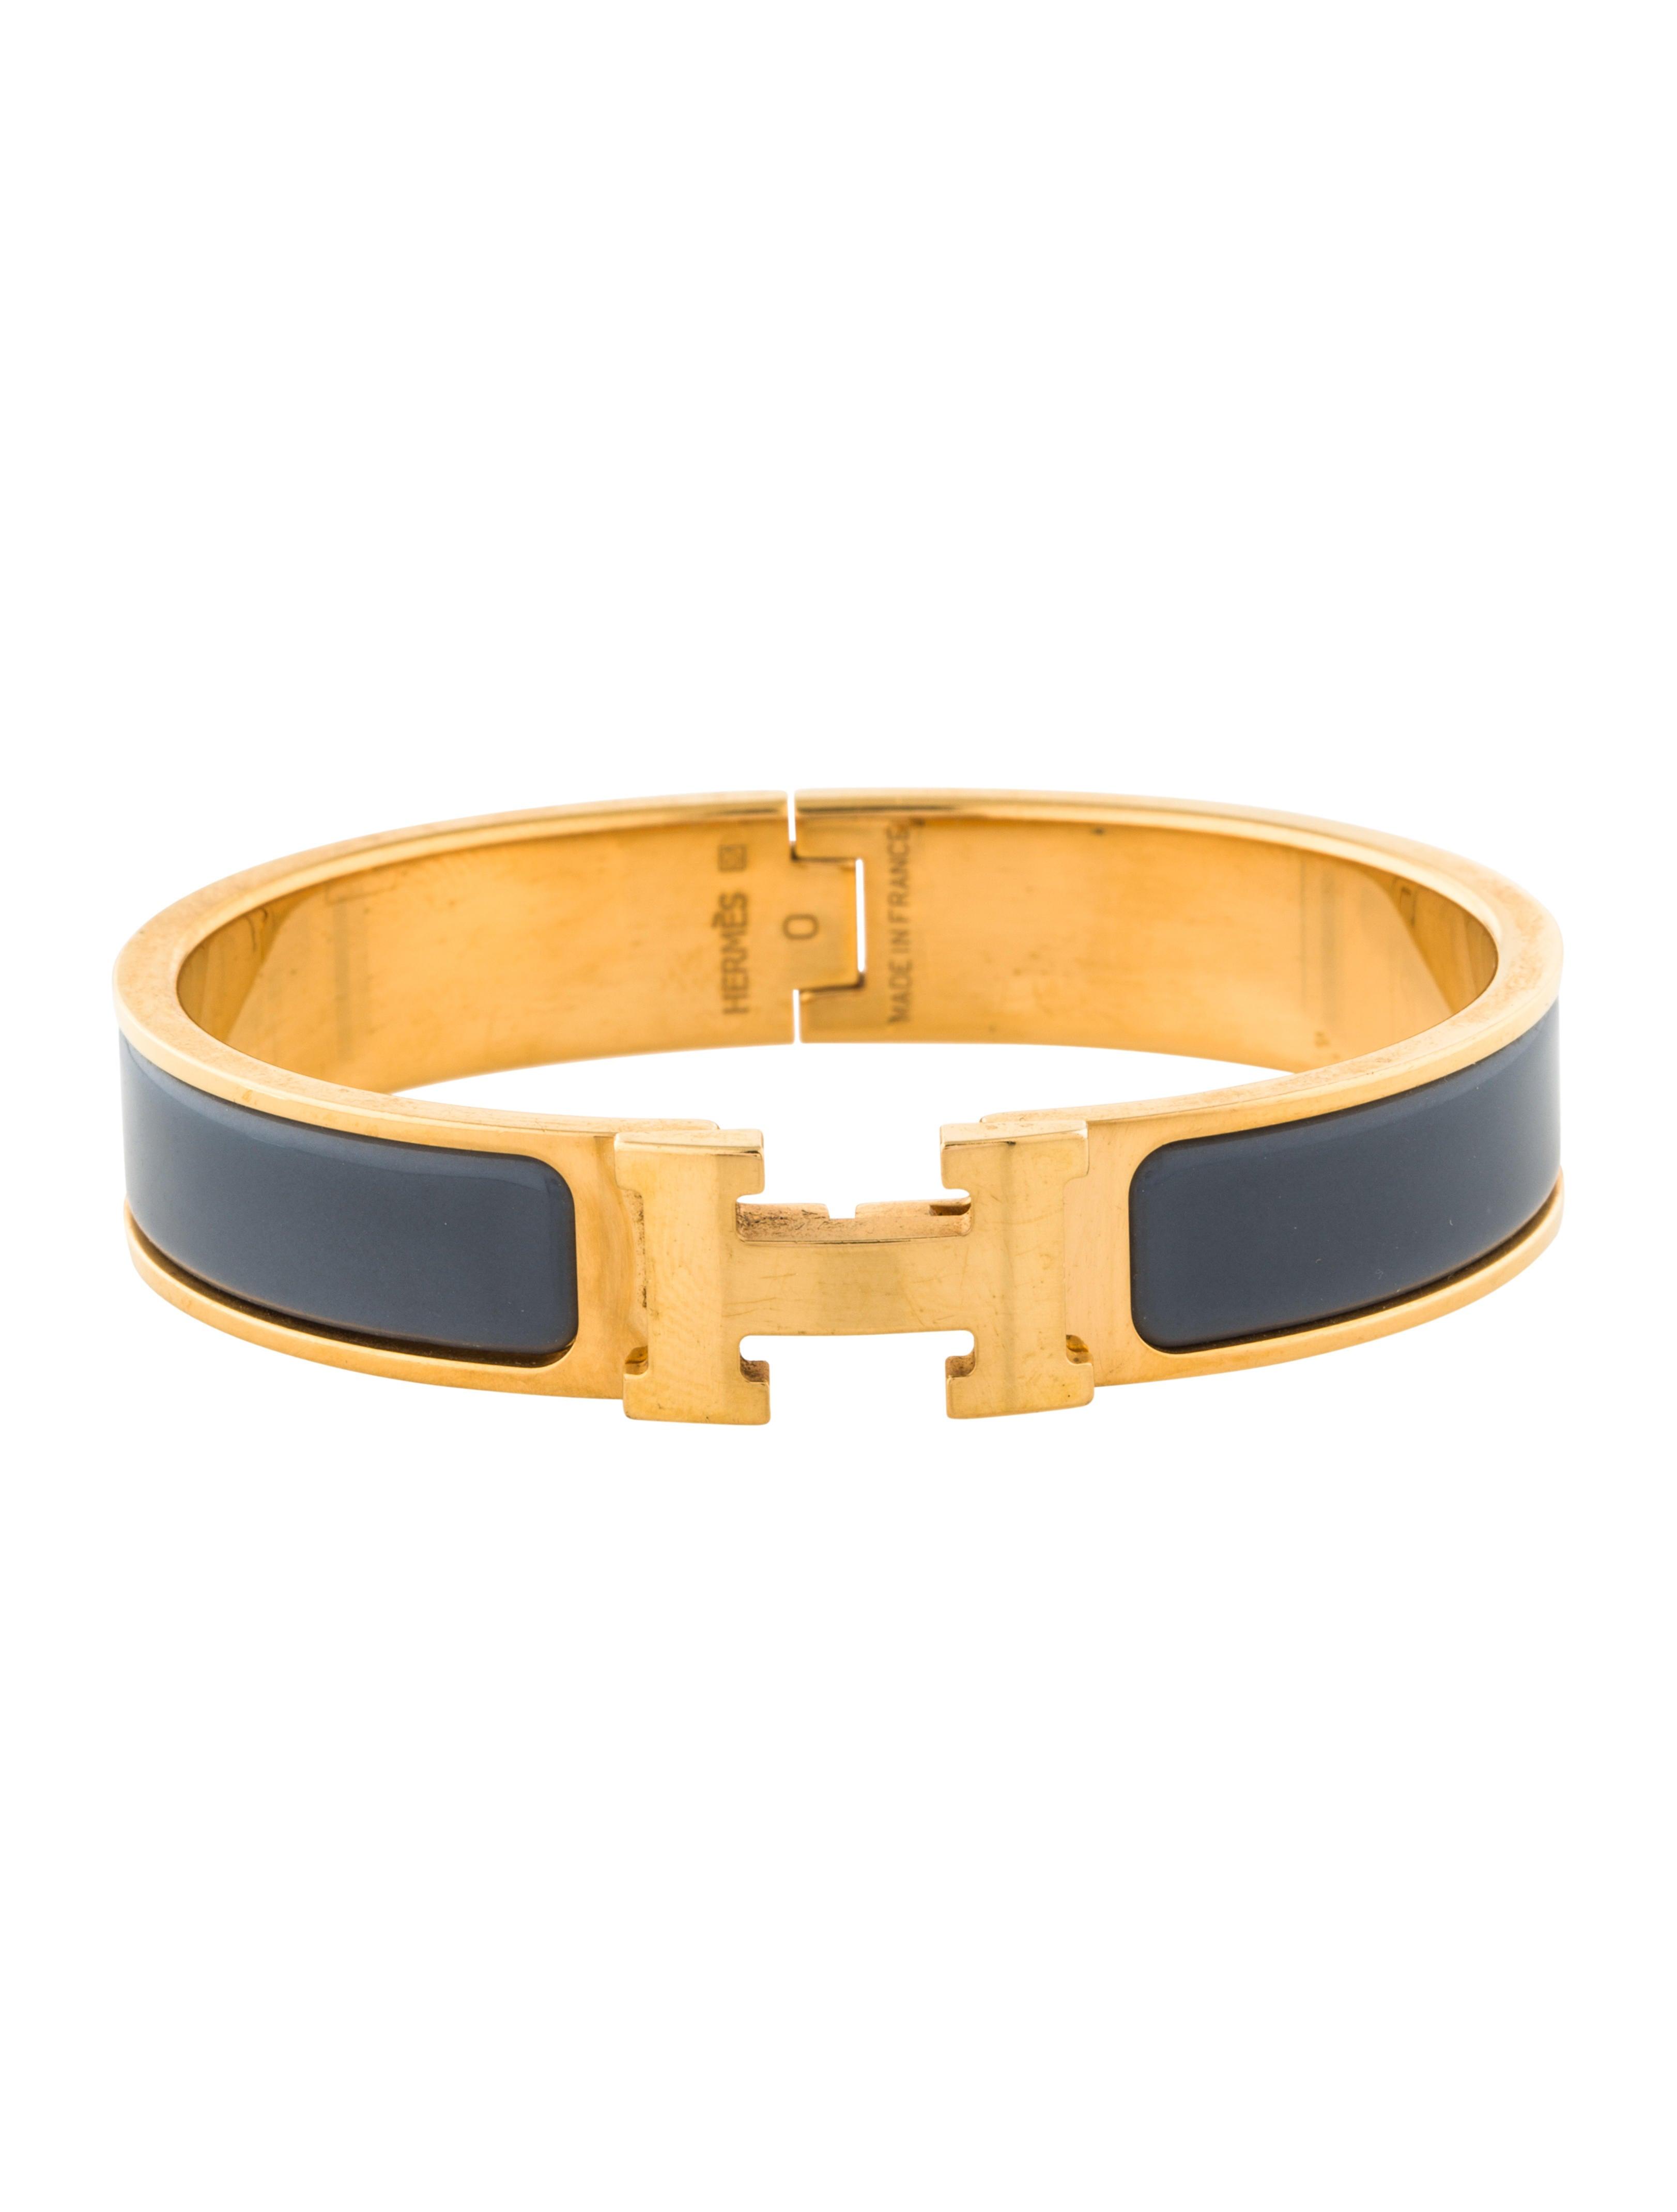 herm 232 s narrow pm clic clac h bracelet bracelets her106468 the realreal